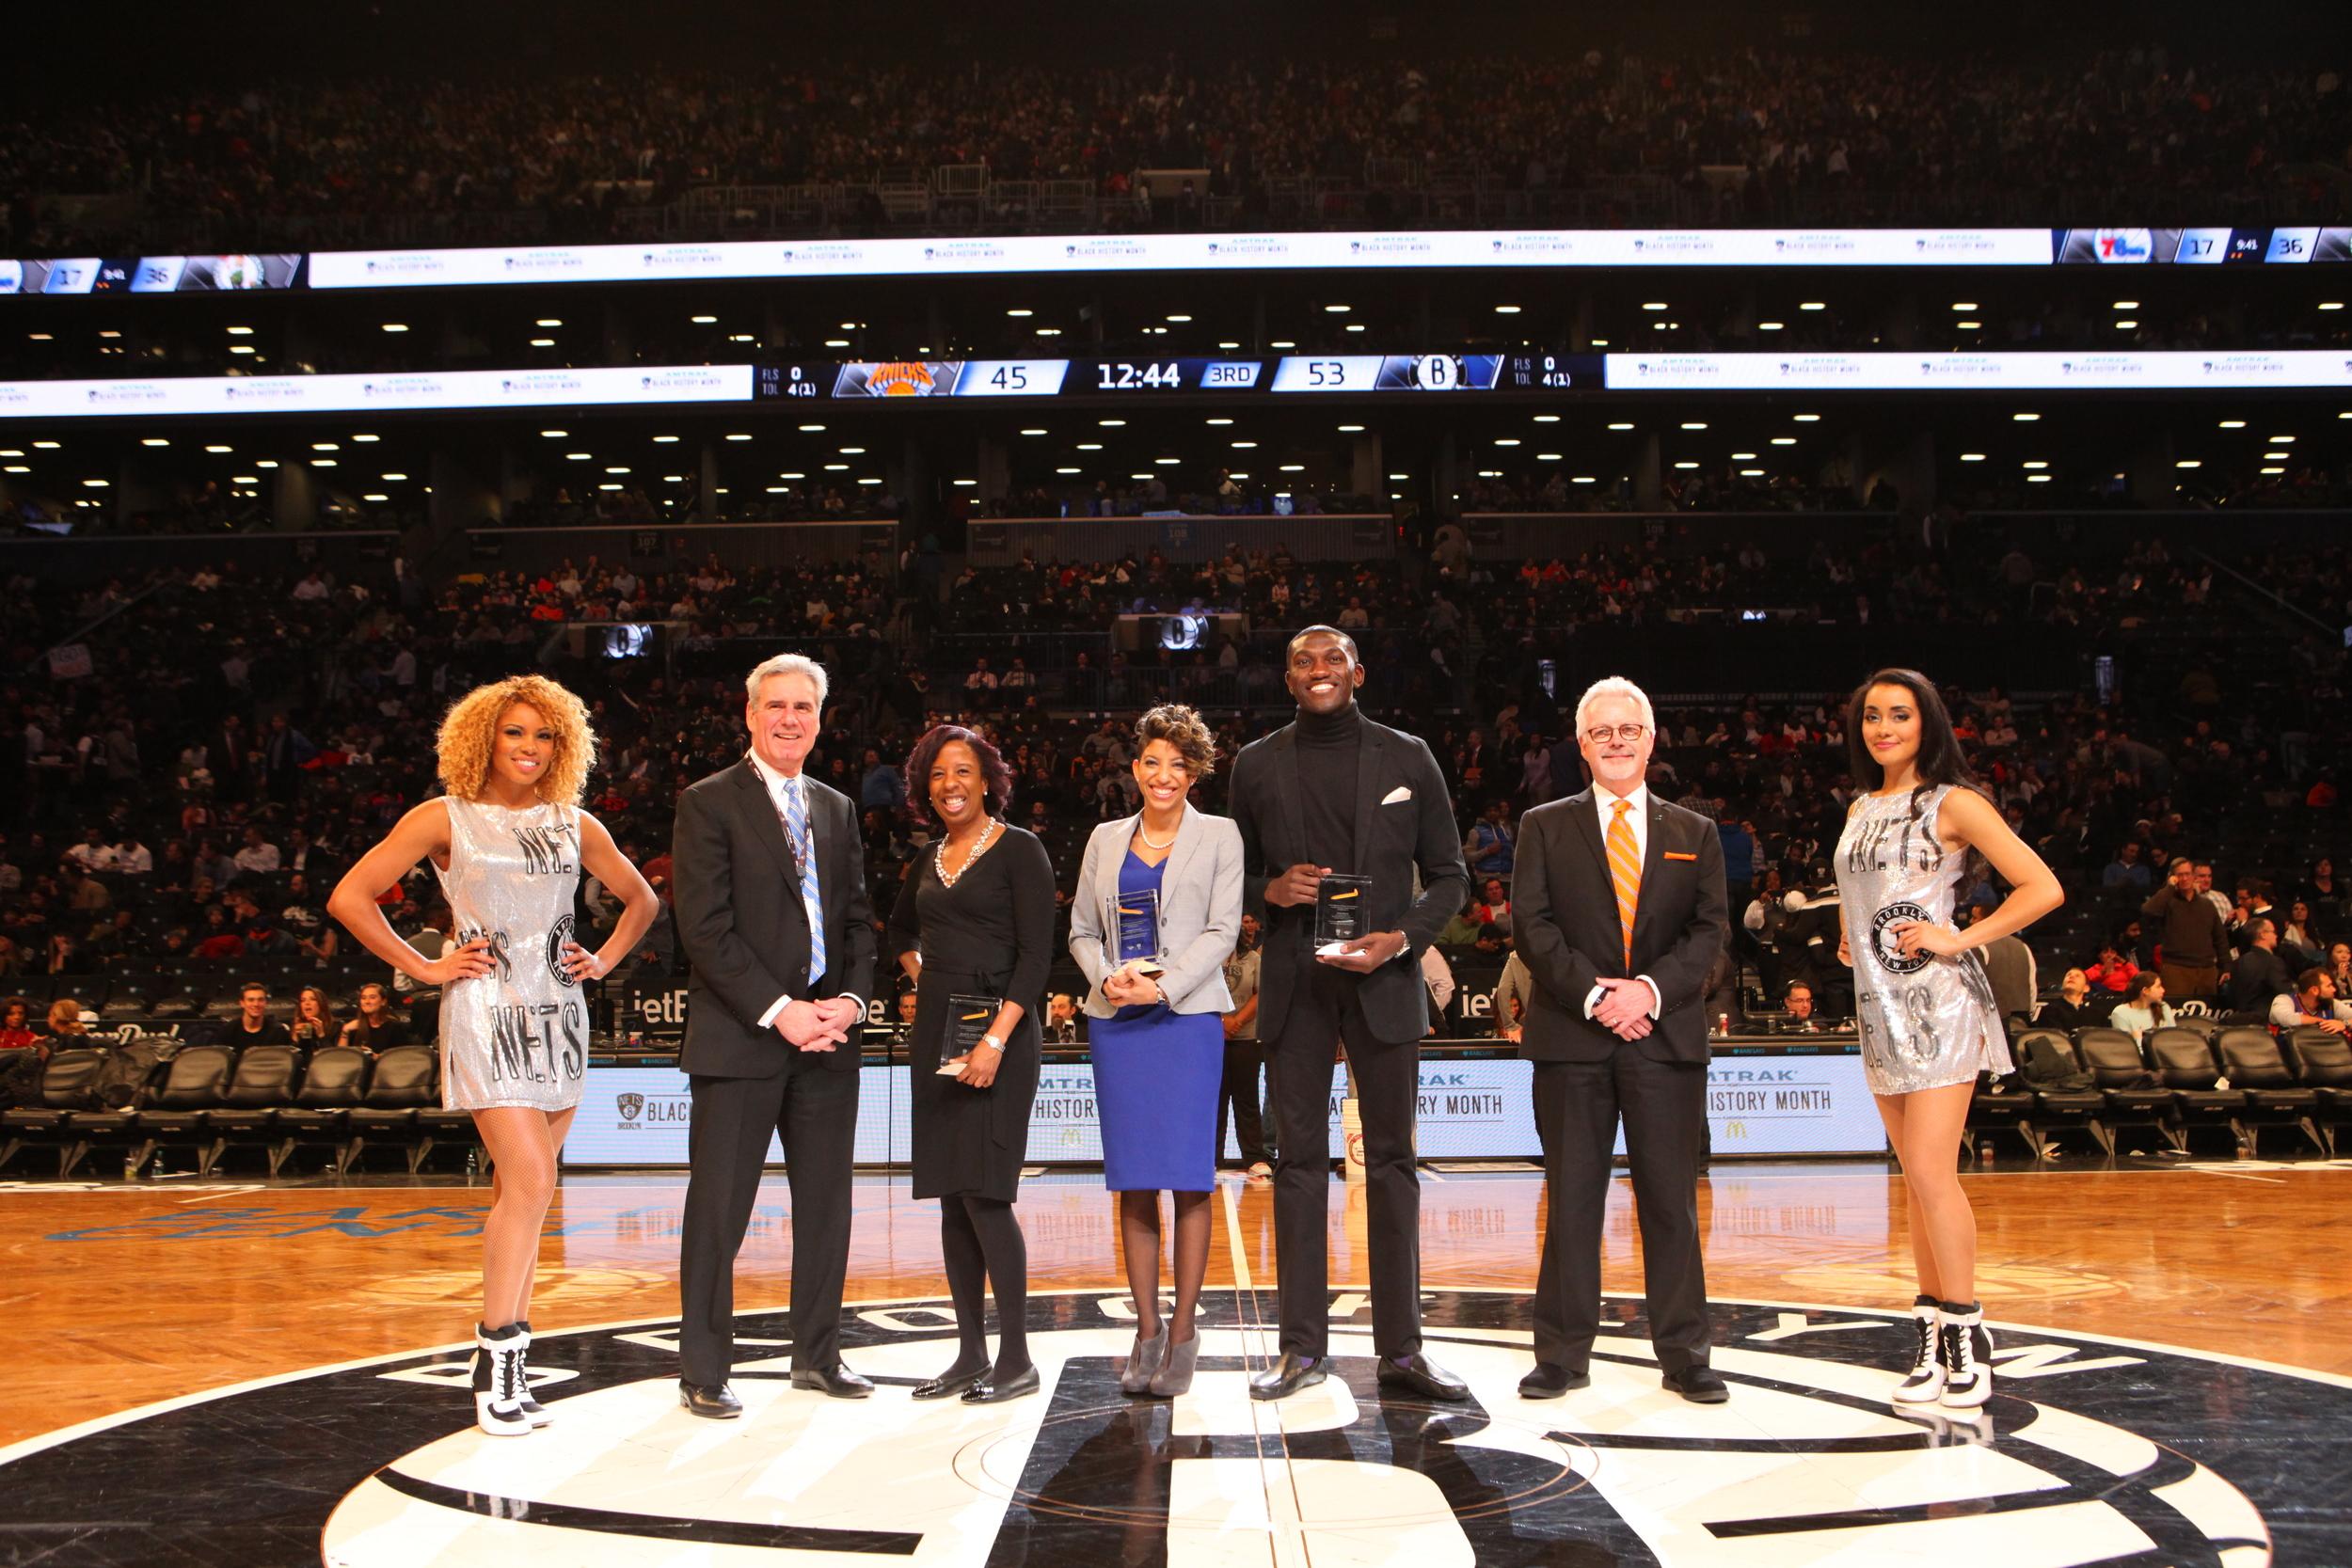 CEO Receives 2015 Amtrak Pioneer Award